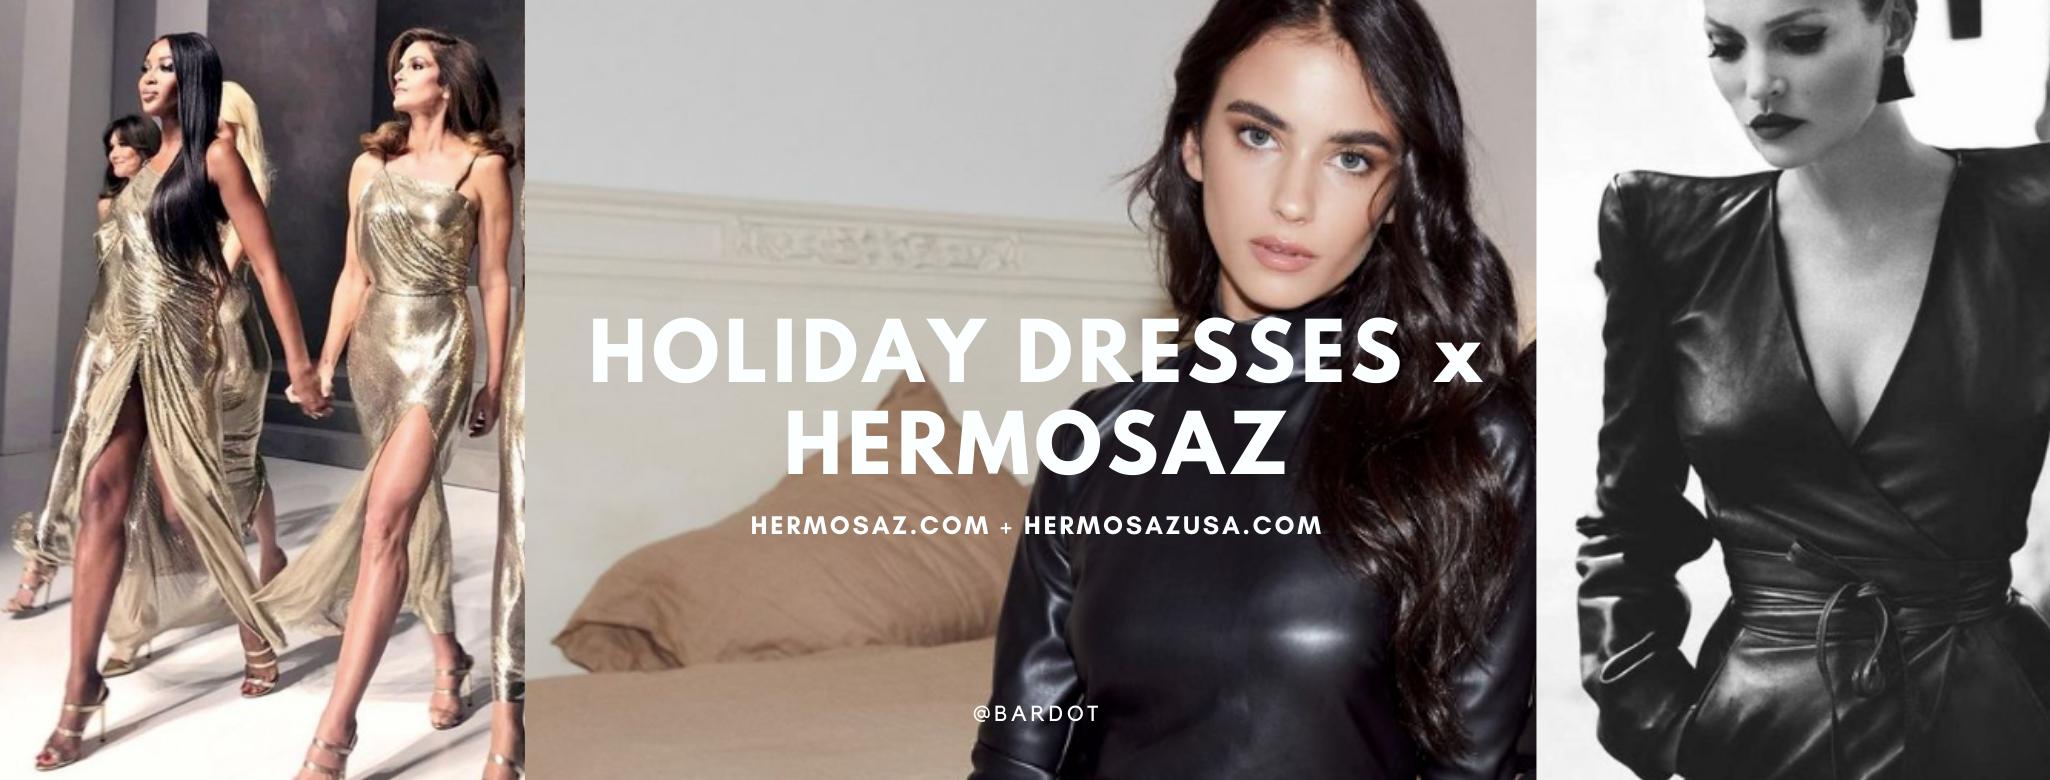 Holiday dresses x Hermosaz